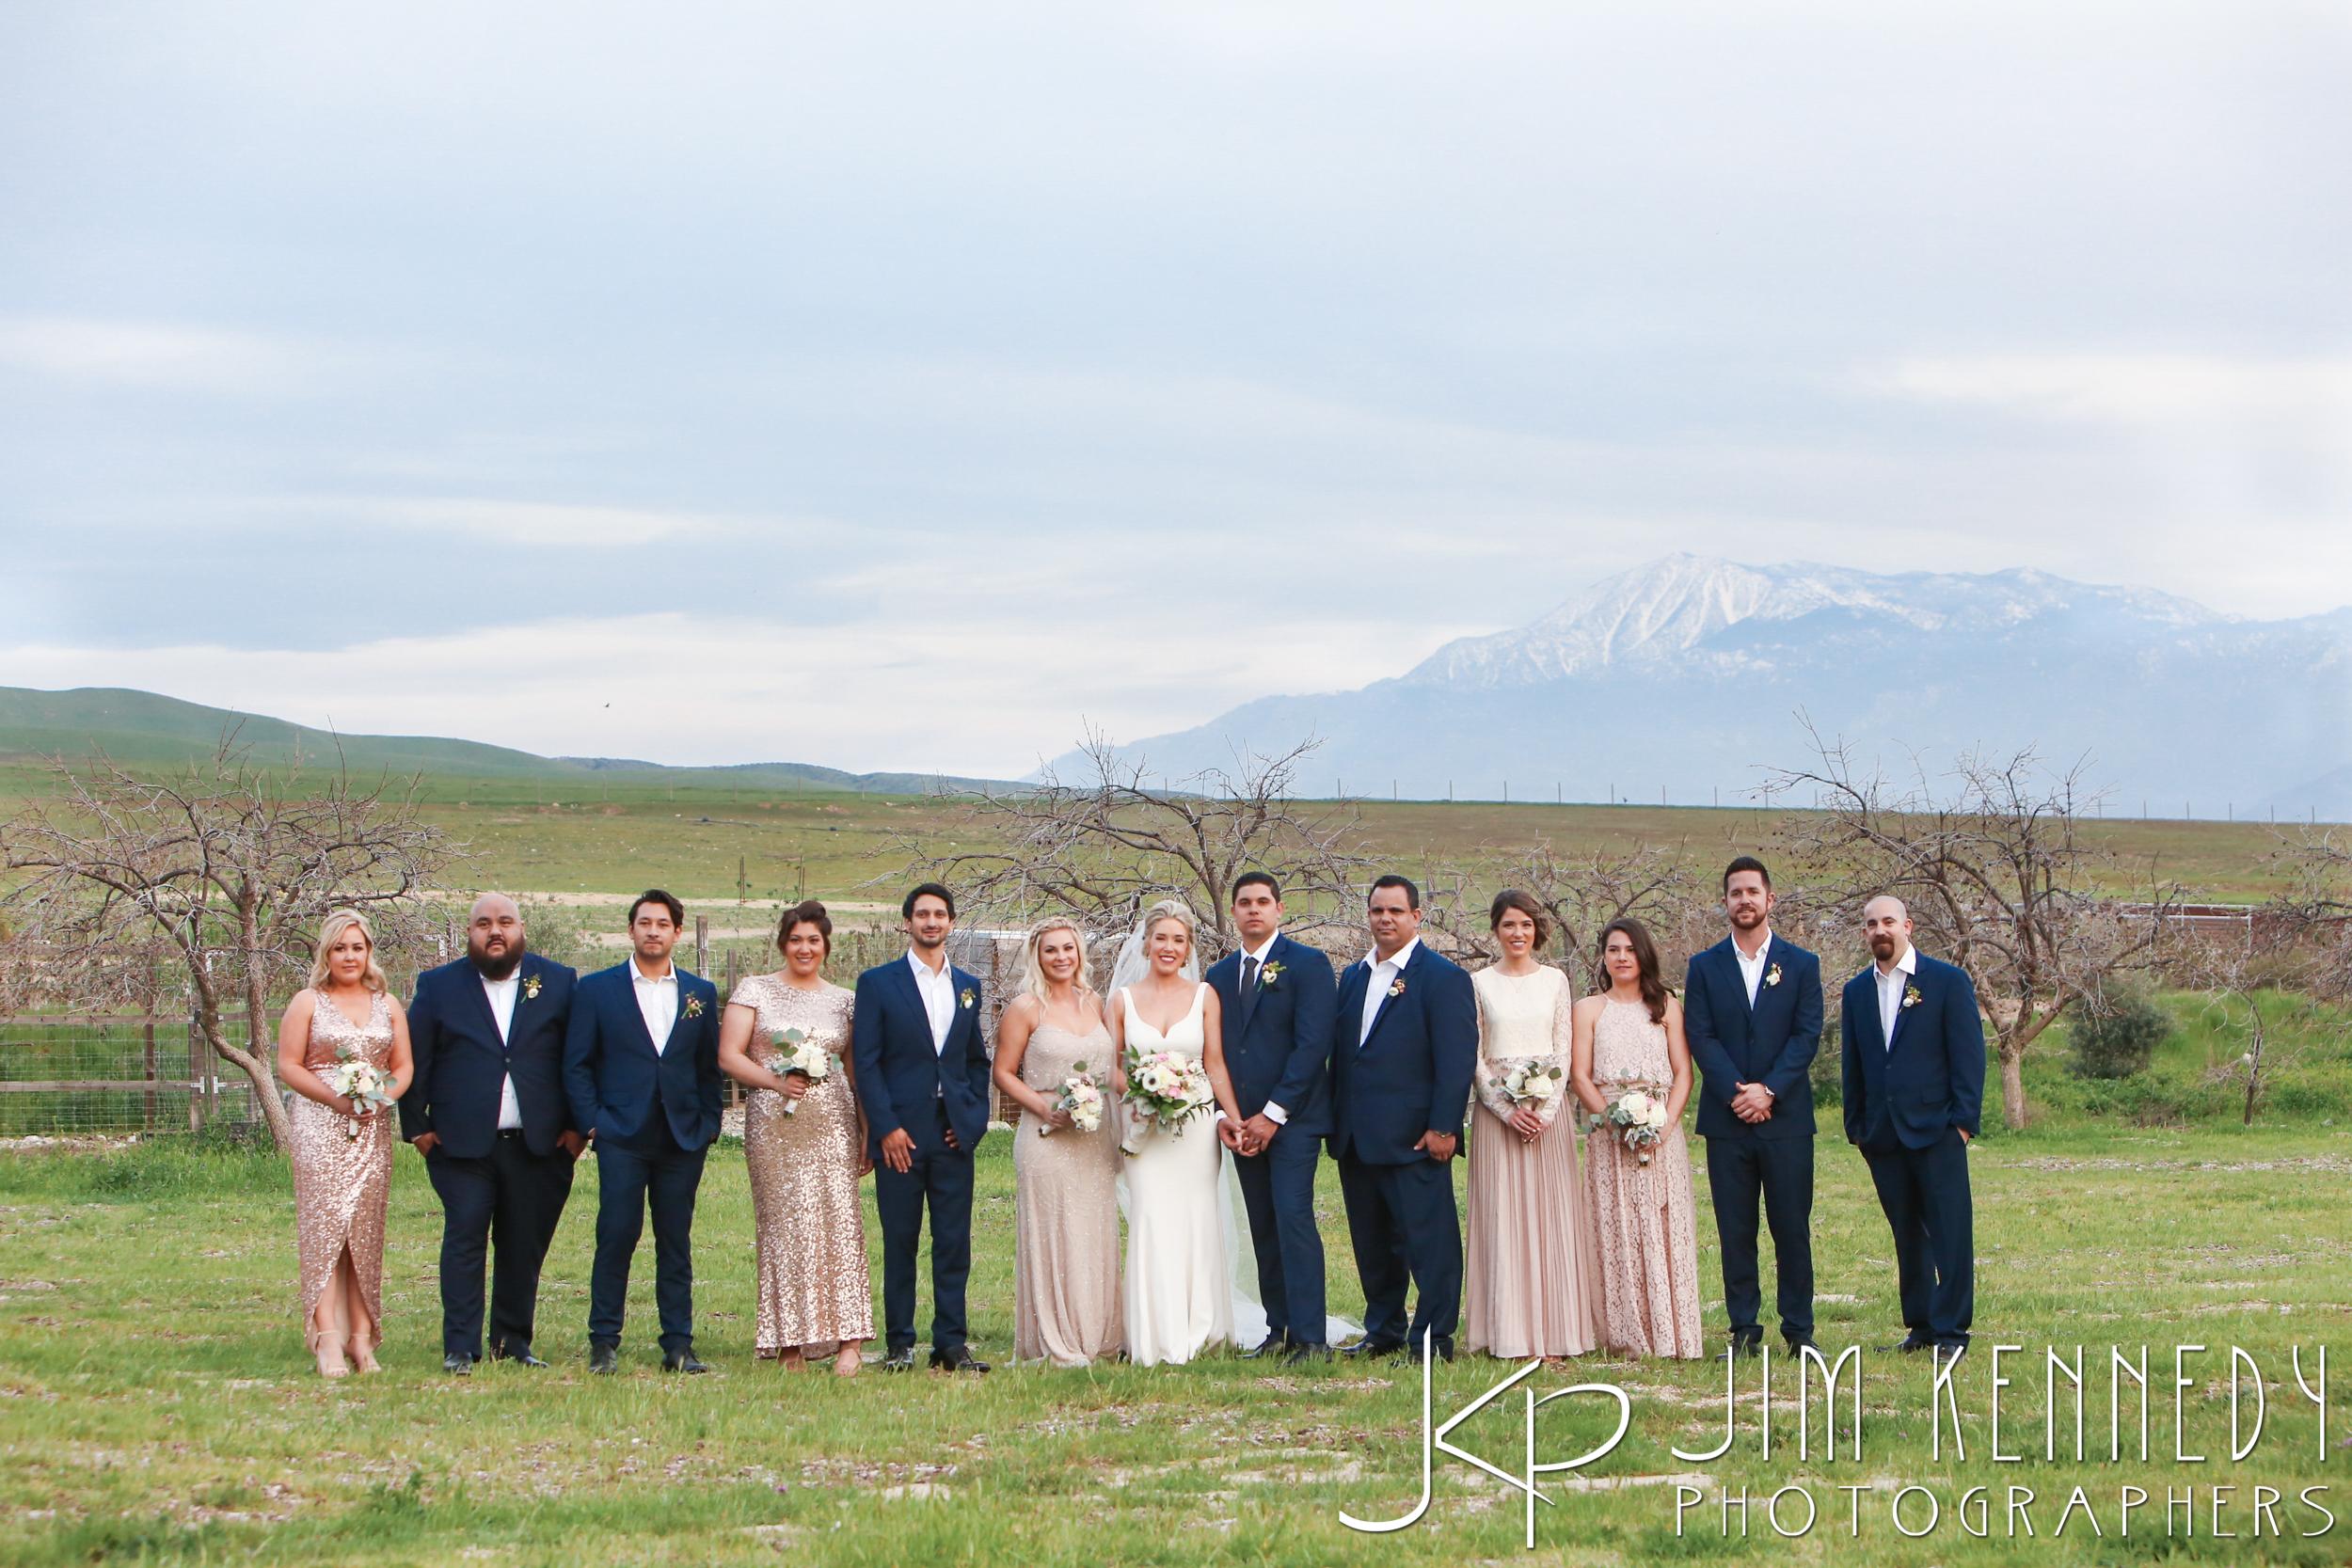 jim_kennedy_photographers_highland_springs_wedding_caitlyn_0130.jpg